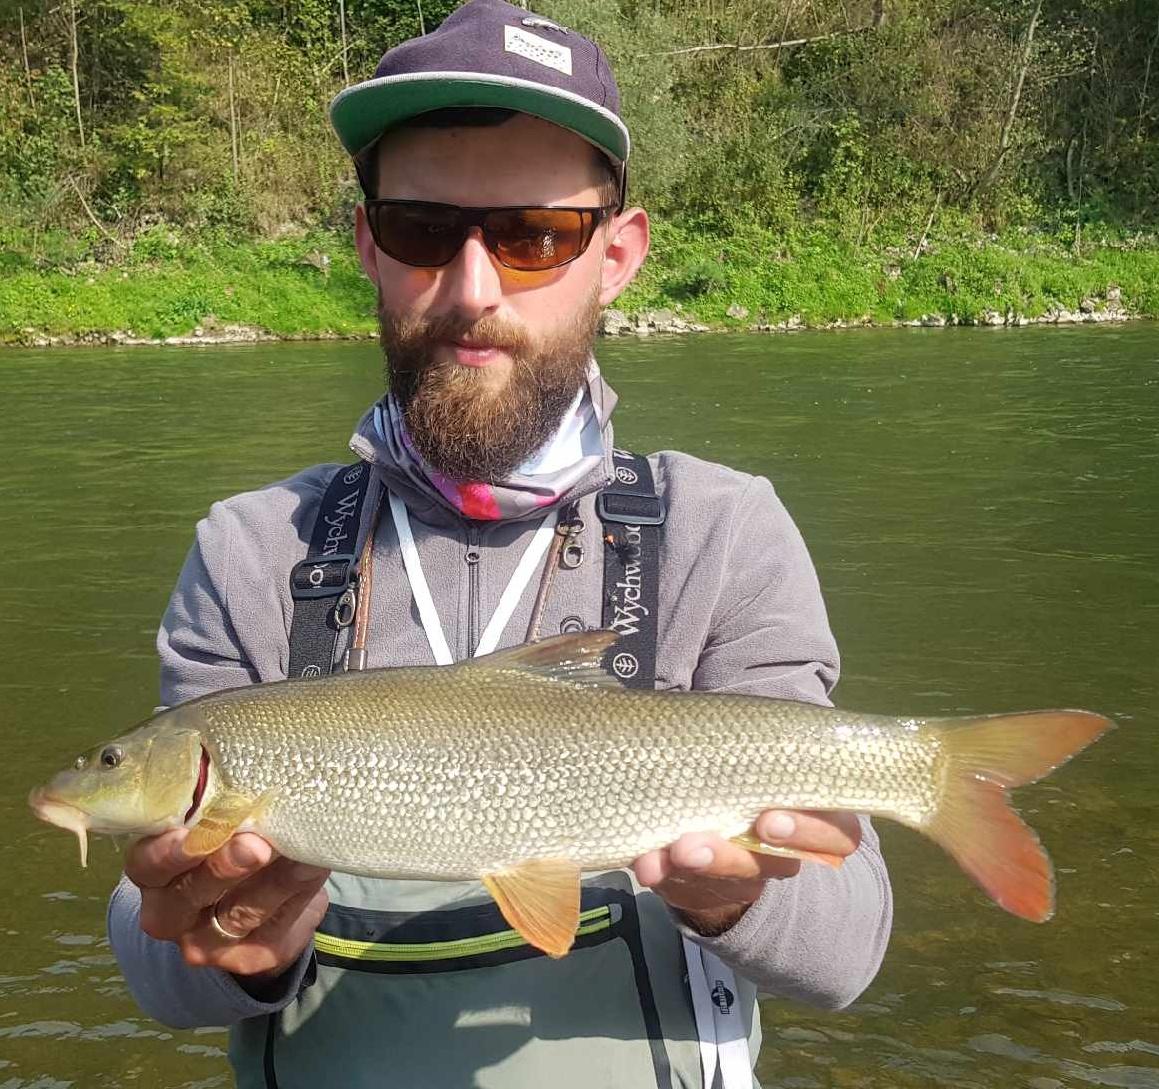 Small barbel - Poland Fly Fishing Dunajec River